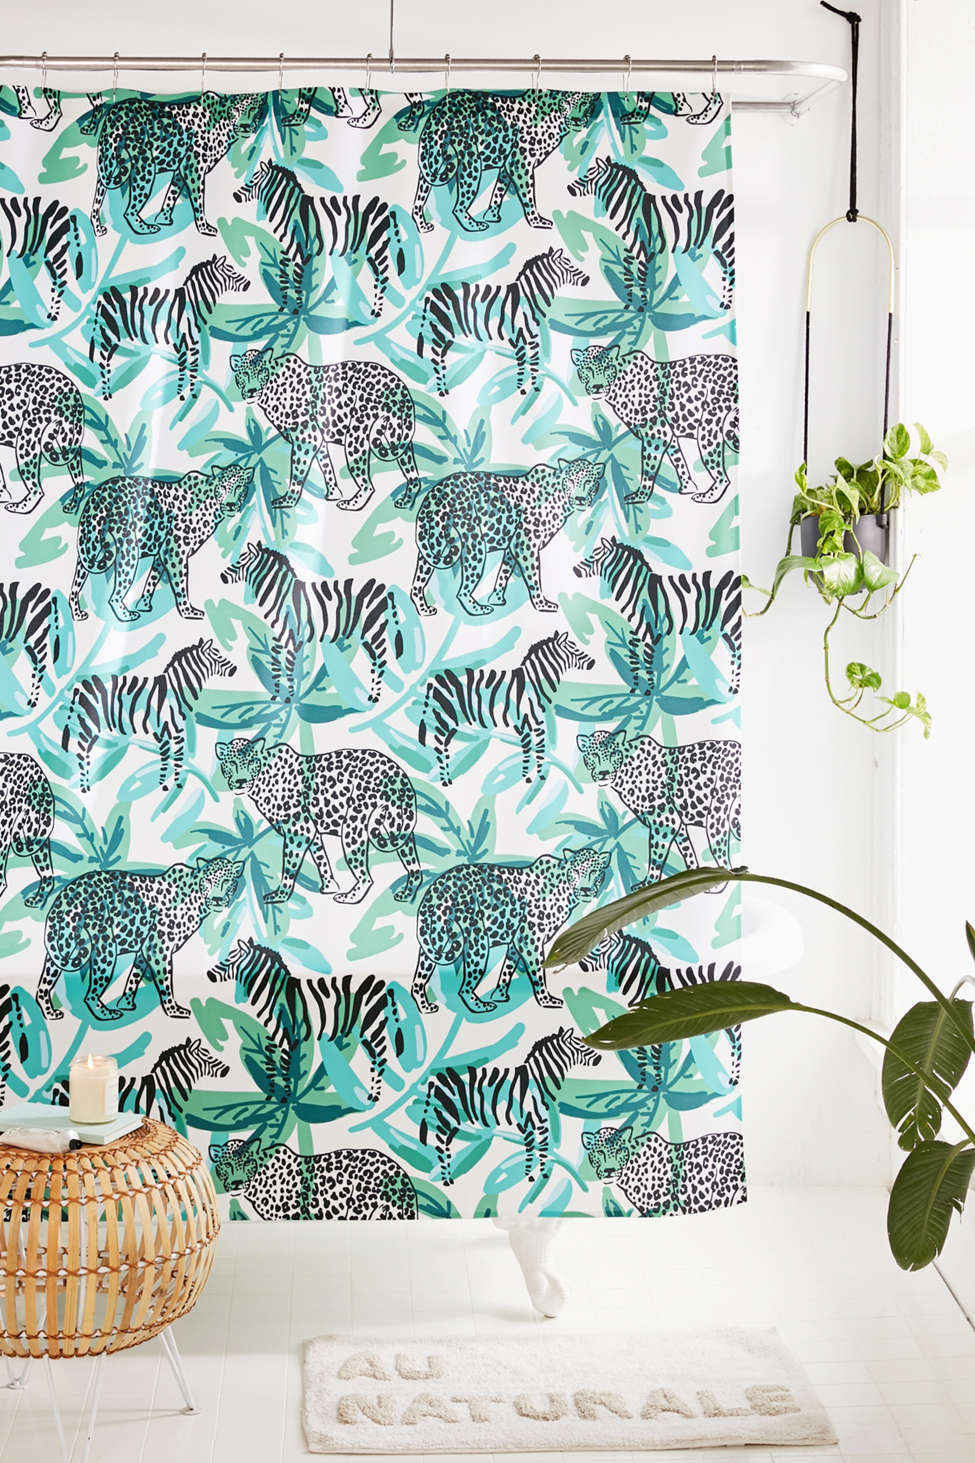 Slide View: 1: OJardin For Deny Leopard Zebra Shower Curtain